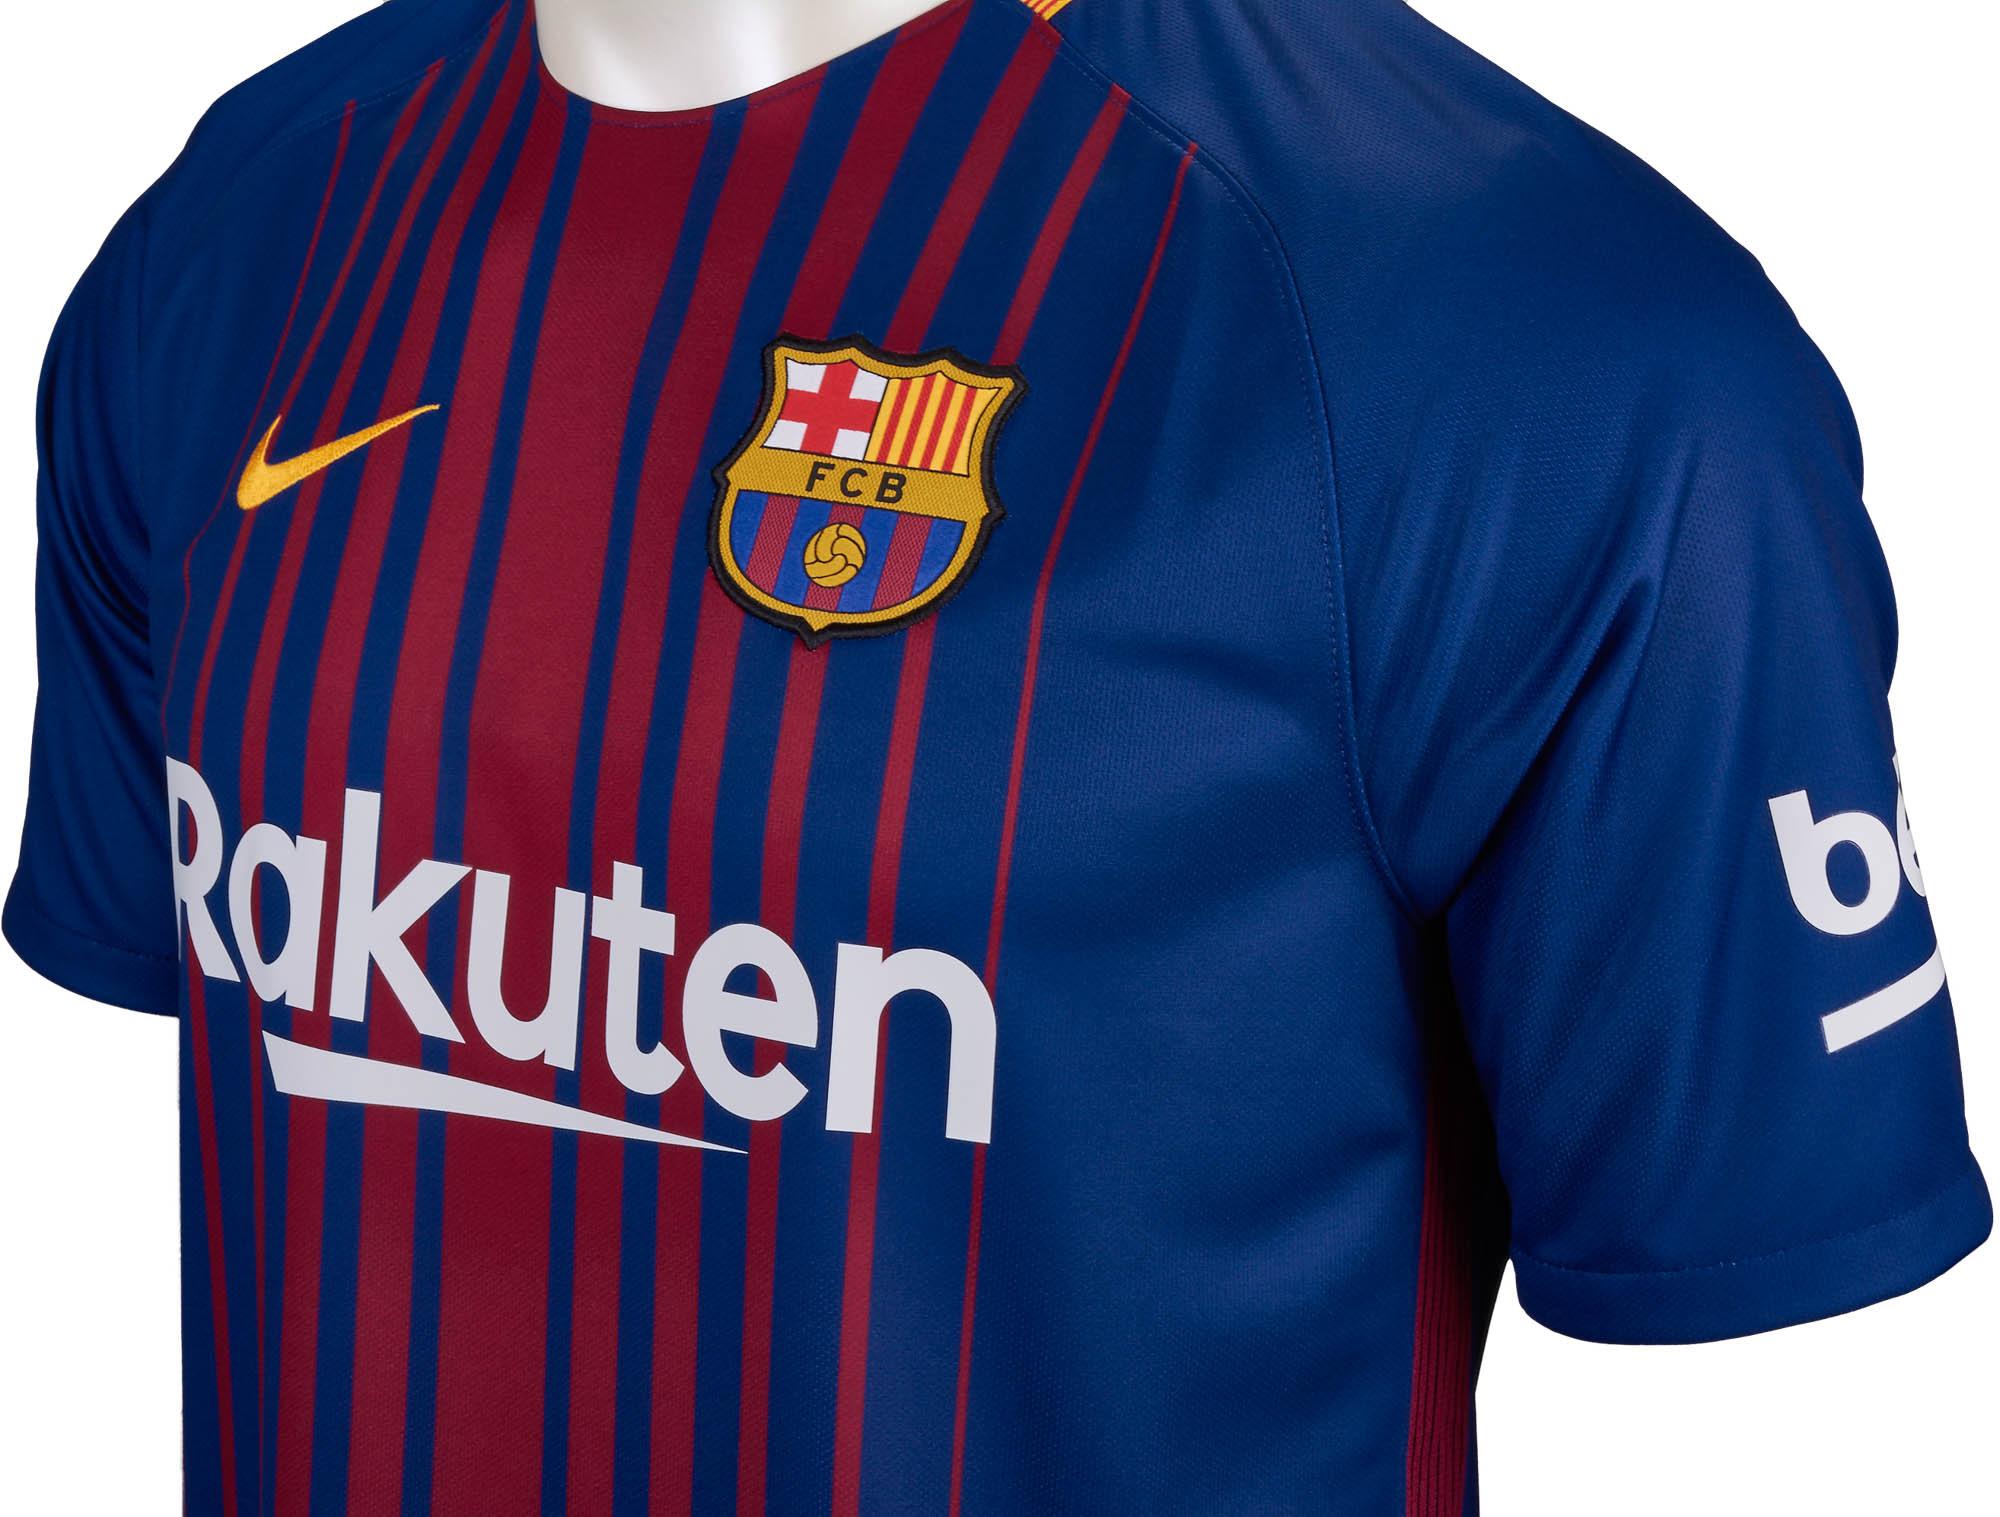 new arrival e7296 37c94 Nike Barcelona Home Jersey - 2017/18 Barcelona Jerseys